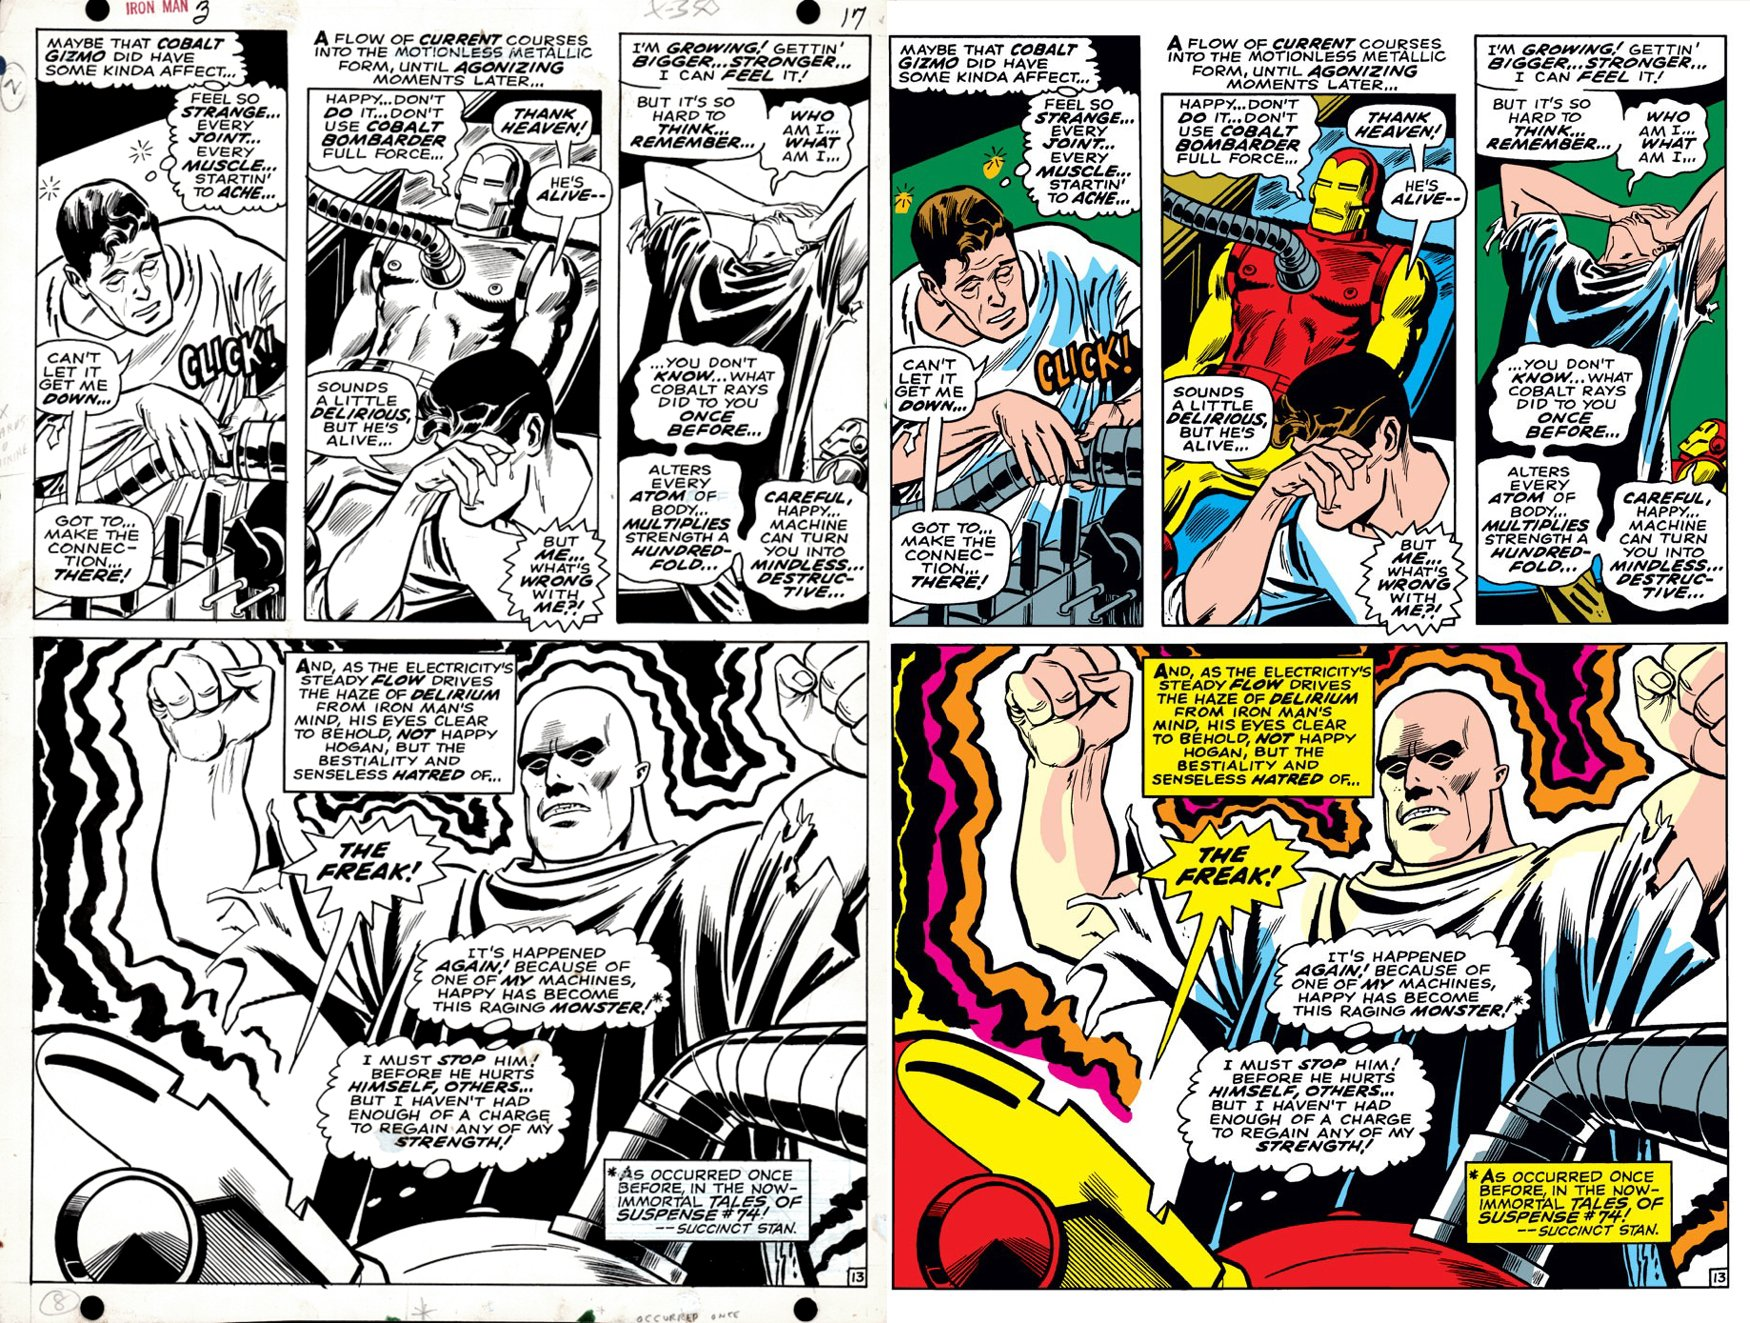 Iron Man #3 p 13 SEMI-SPLASH (IRON MAN BATTLES THE FREAK!) 1968